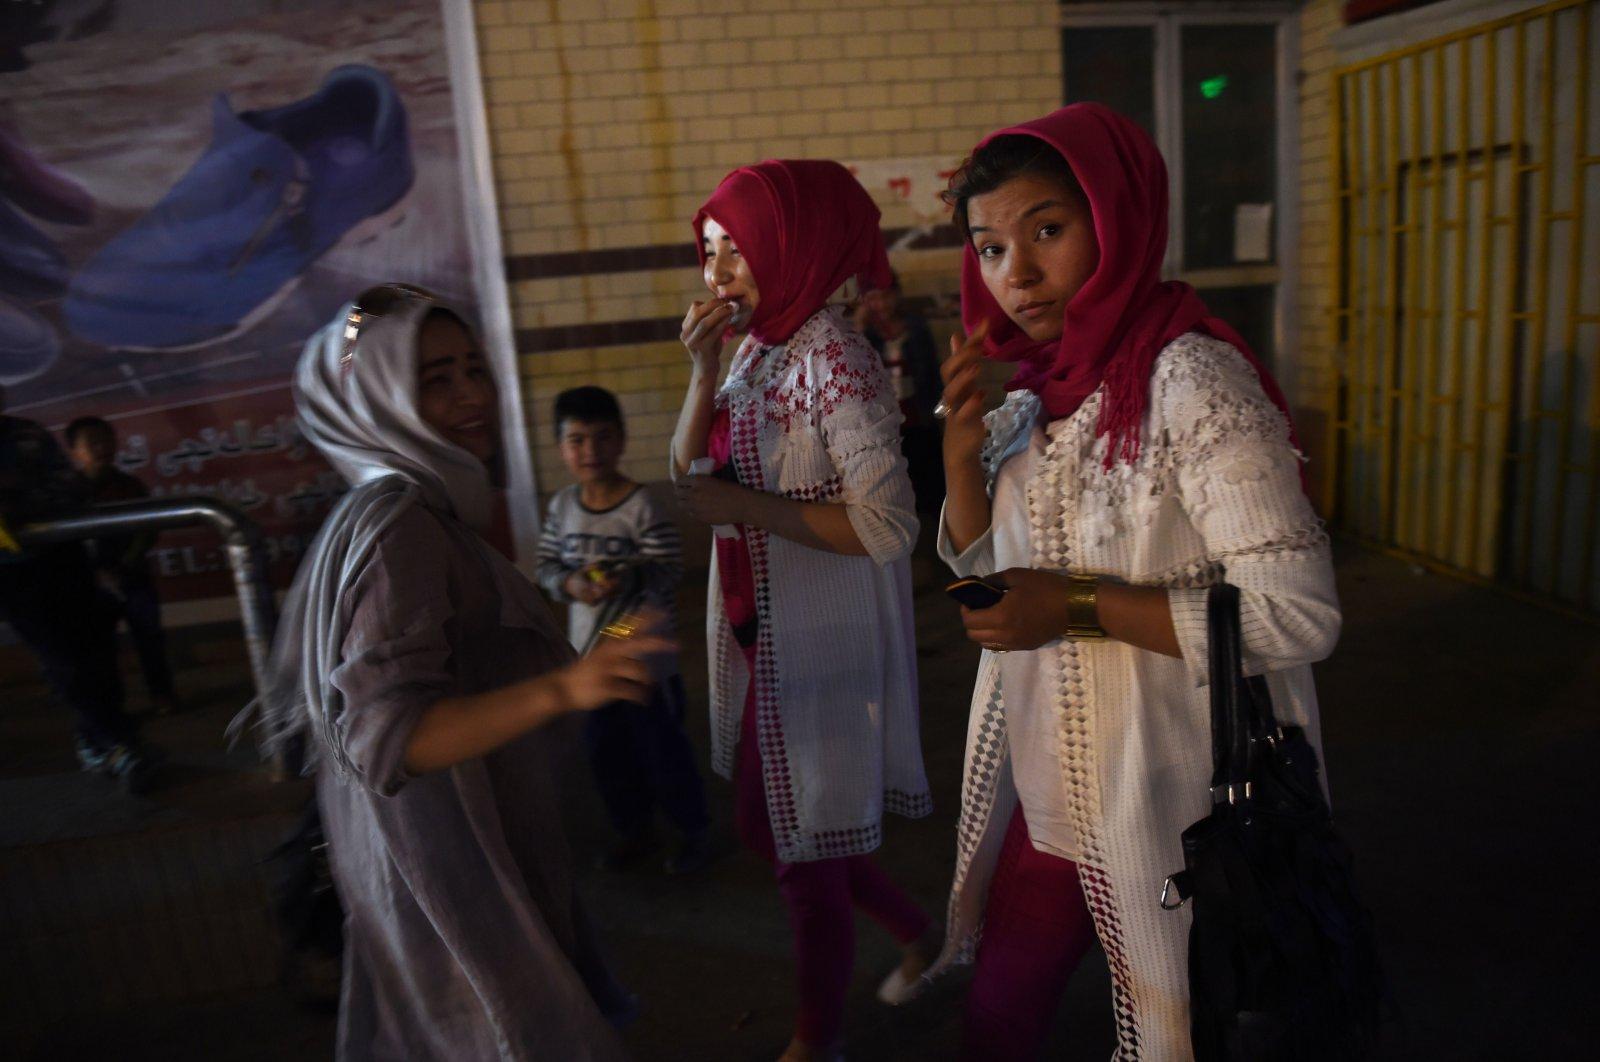 Uighur women at a market in China's western Xinjiang region, April 16, 2015. (AFP Photo)